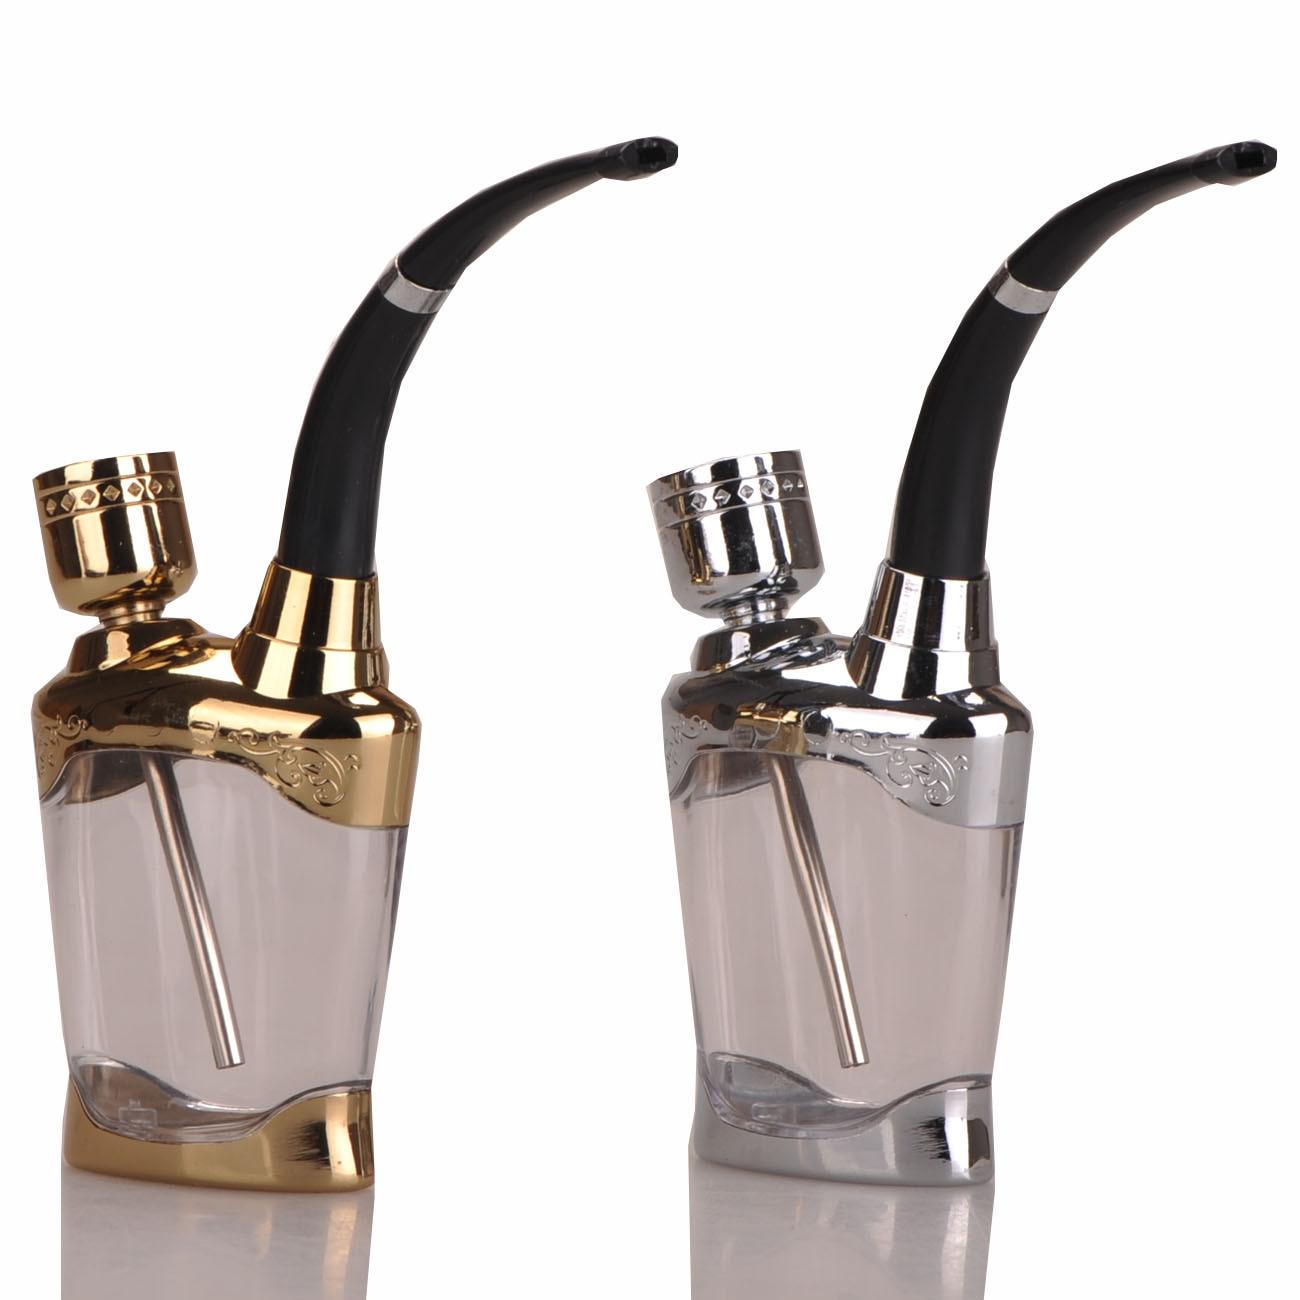 Gold Silver Portable Metal Smoking Pipes Cheap Water